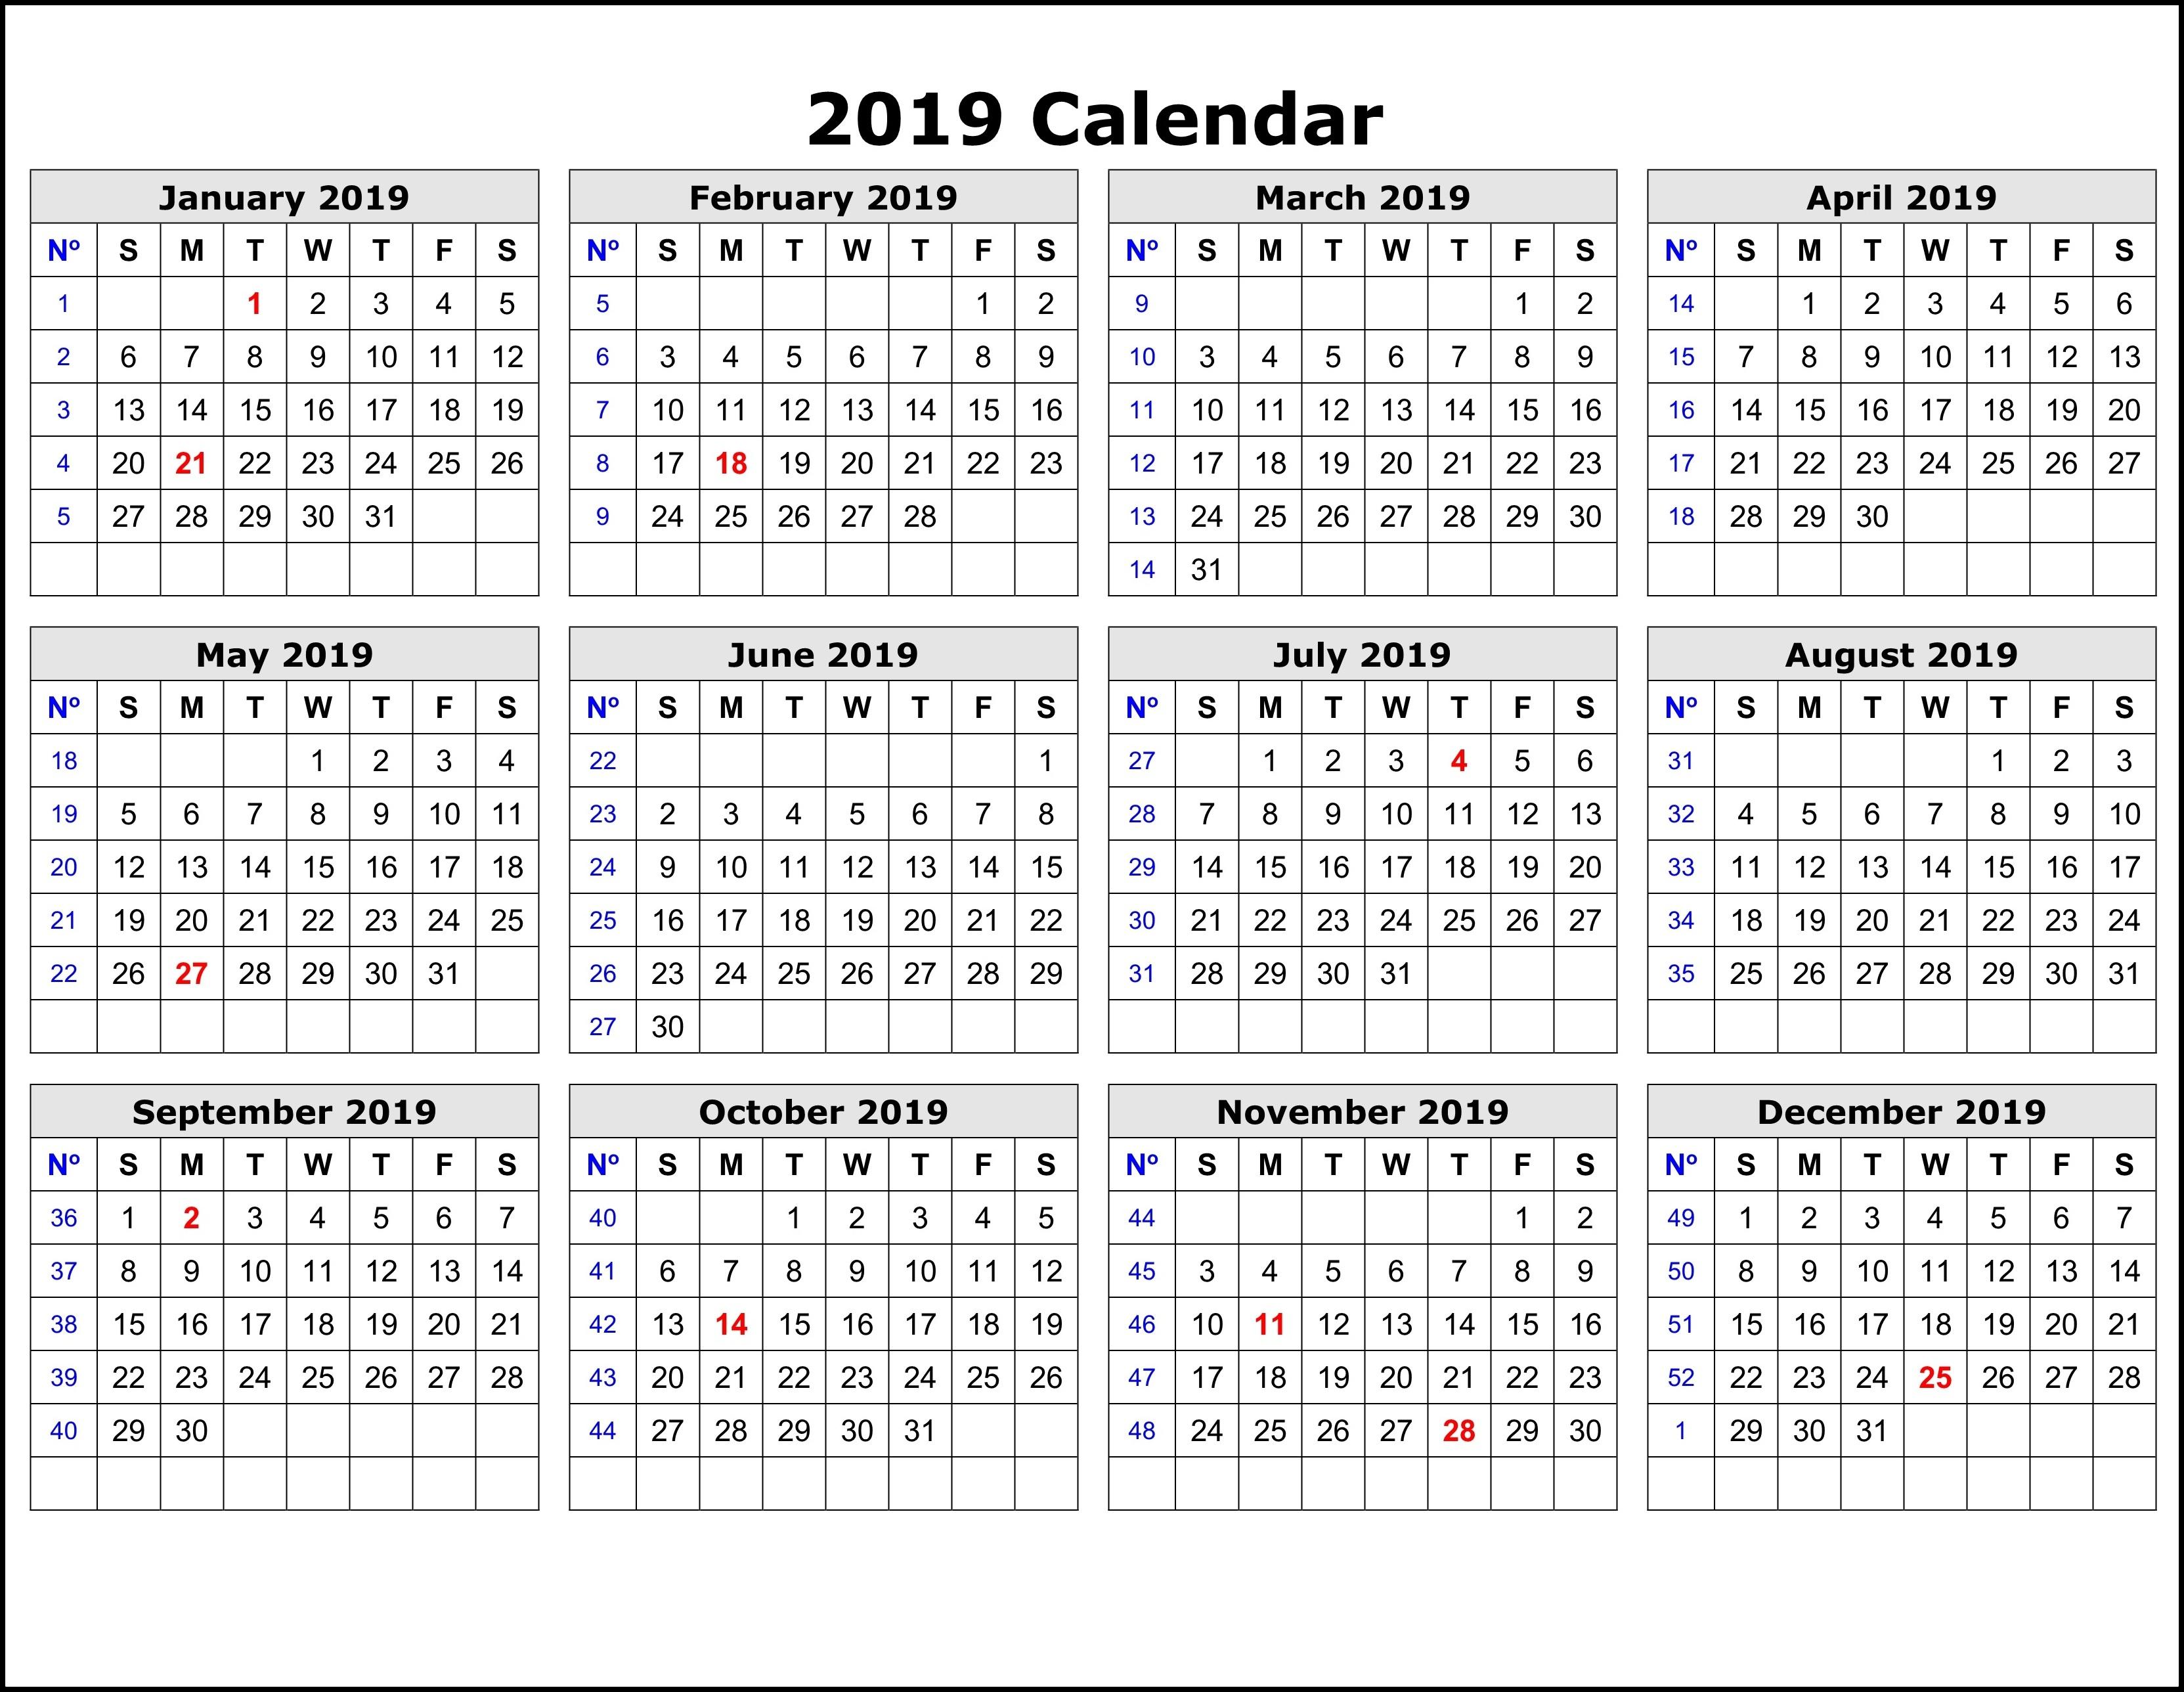 2019 Calendar Template By Week